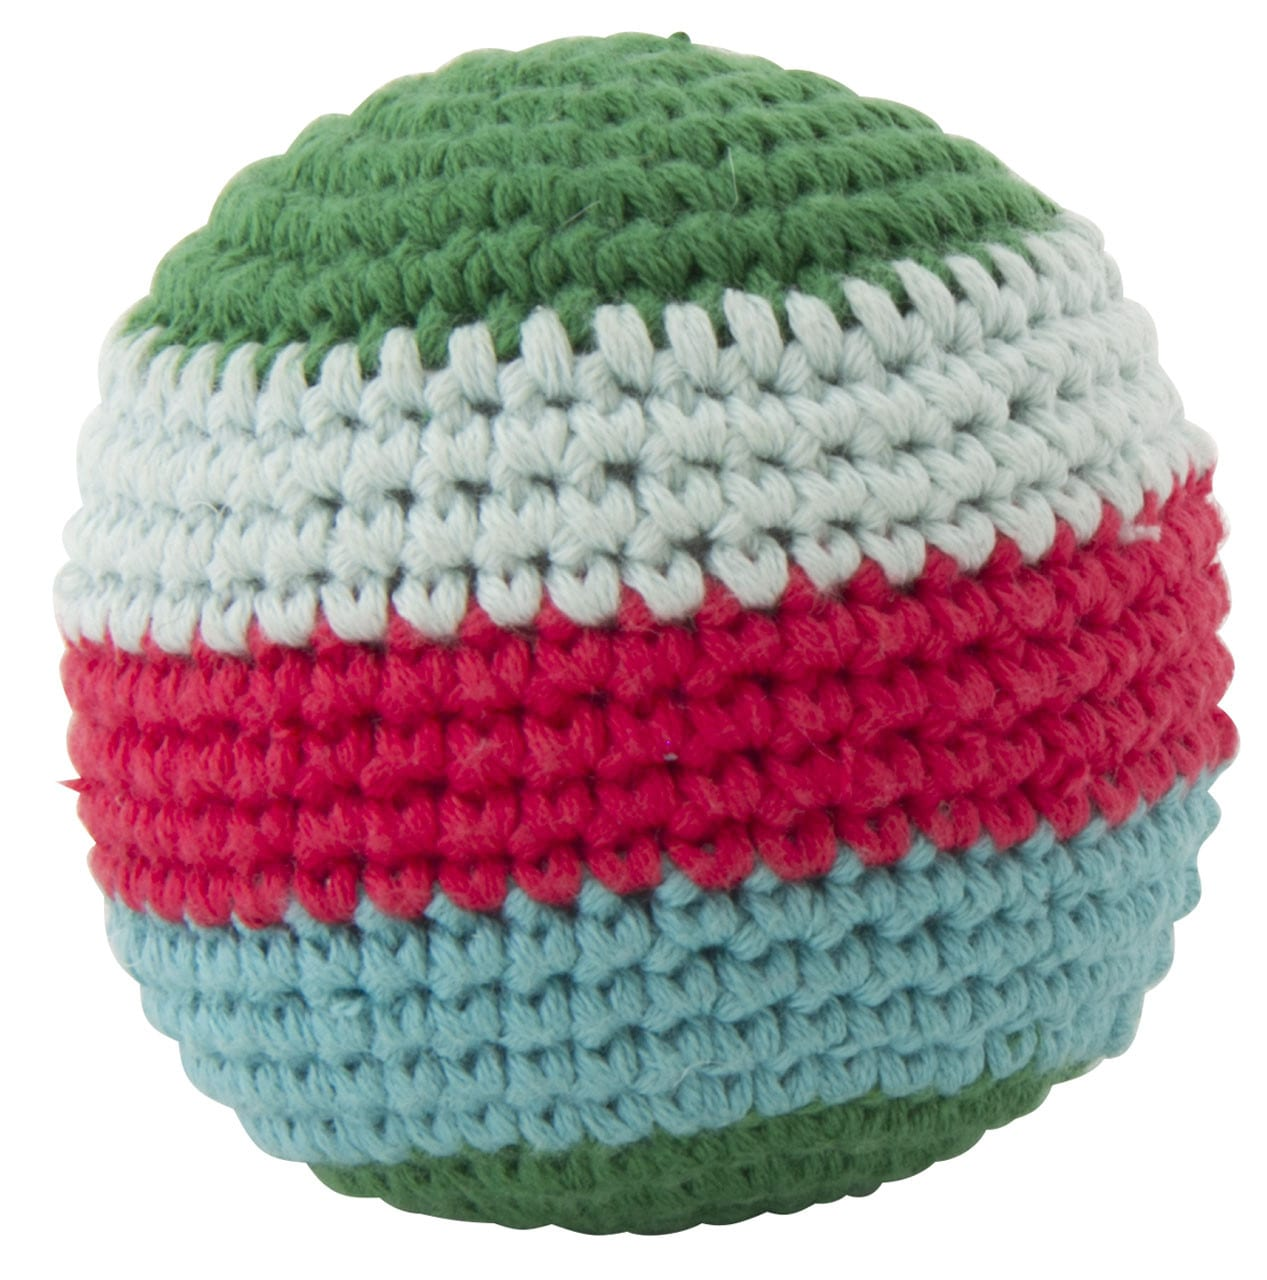 Crochet Ball Small Stripe With Beep Global Affairs